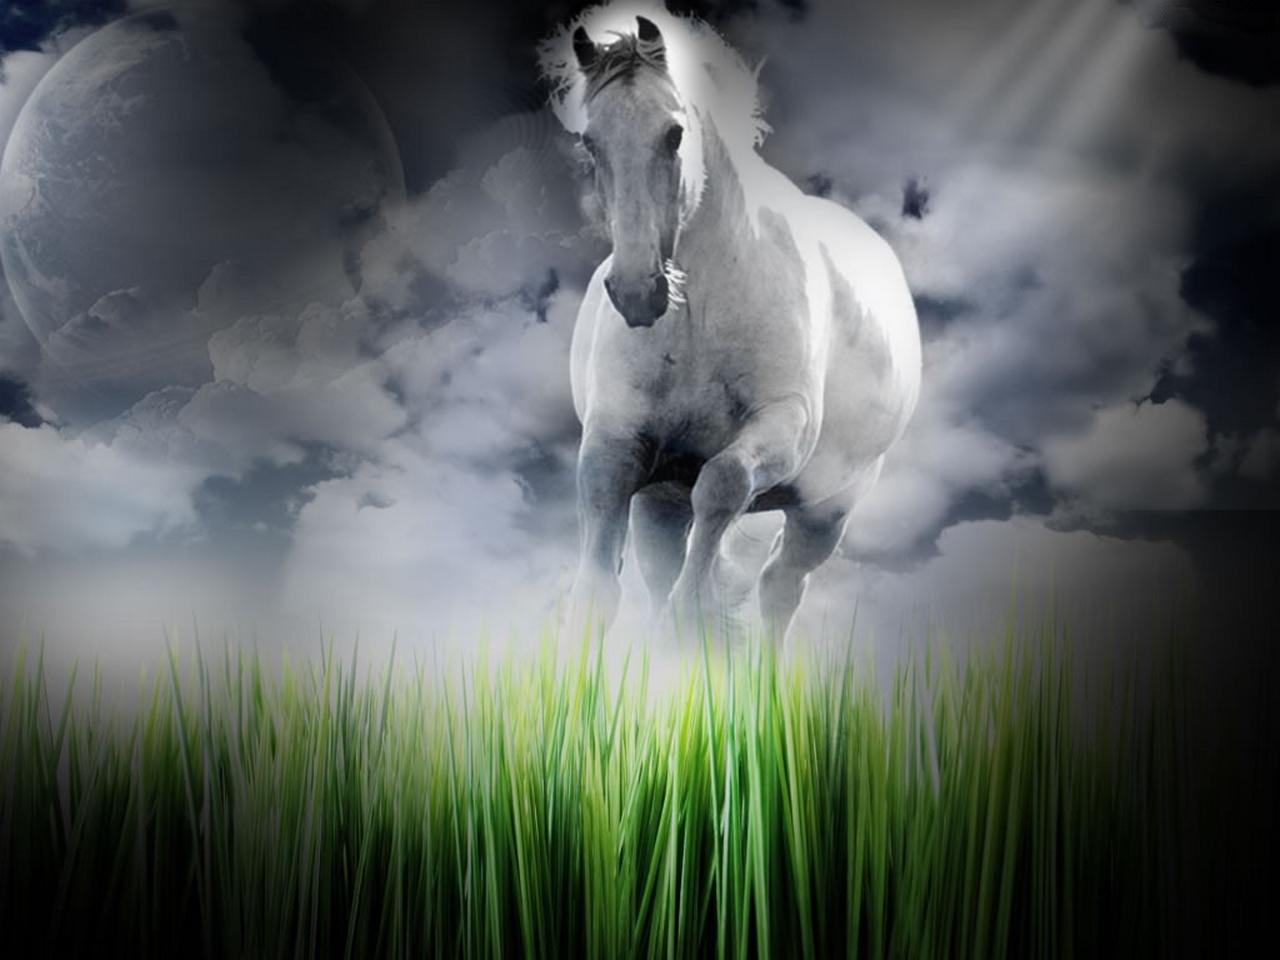 running horse animal wallpaper download 1280x960